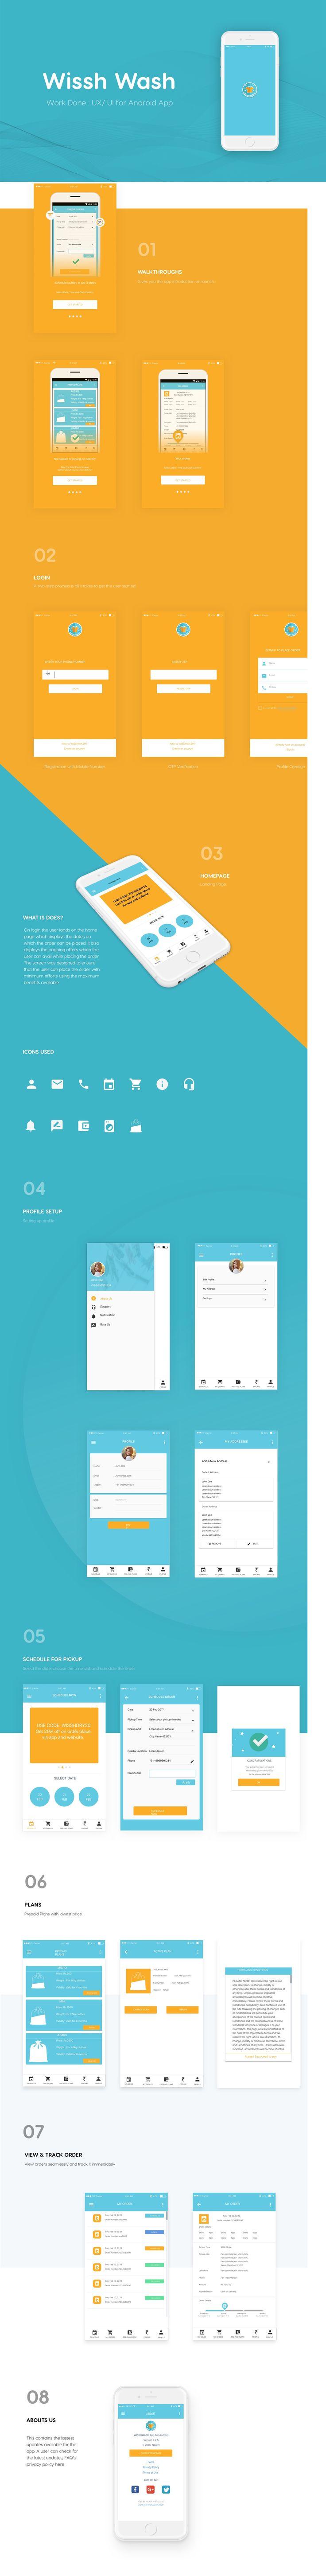 UI design for laundry service company (Wissh Wash)